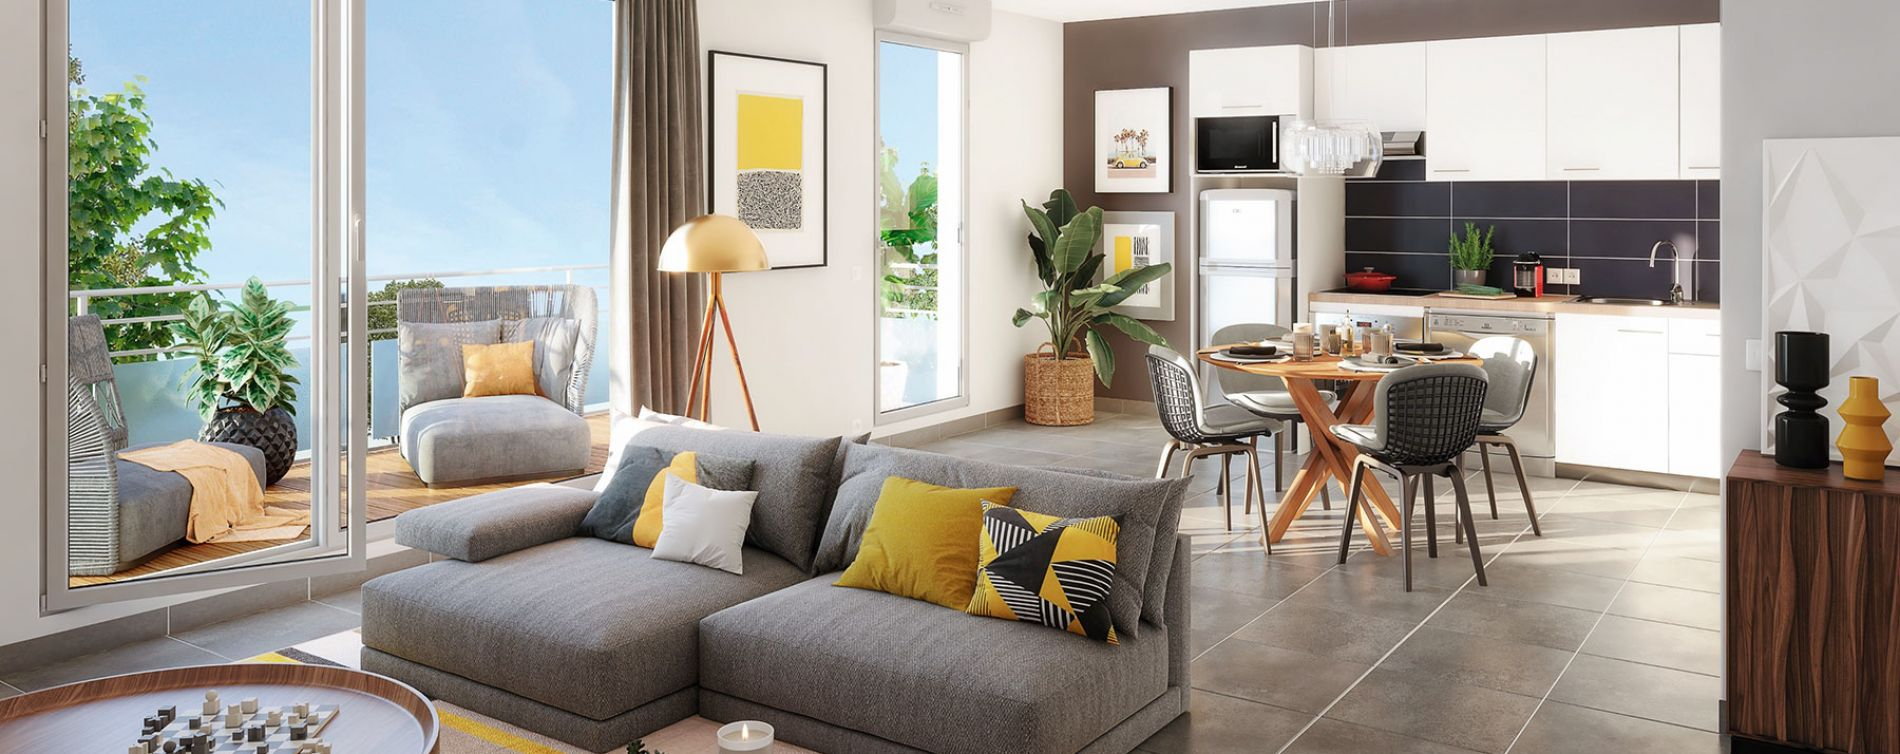 Toulouse : programme immobilier neuve « Hameau Dhuoda » (3)